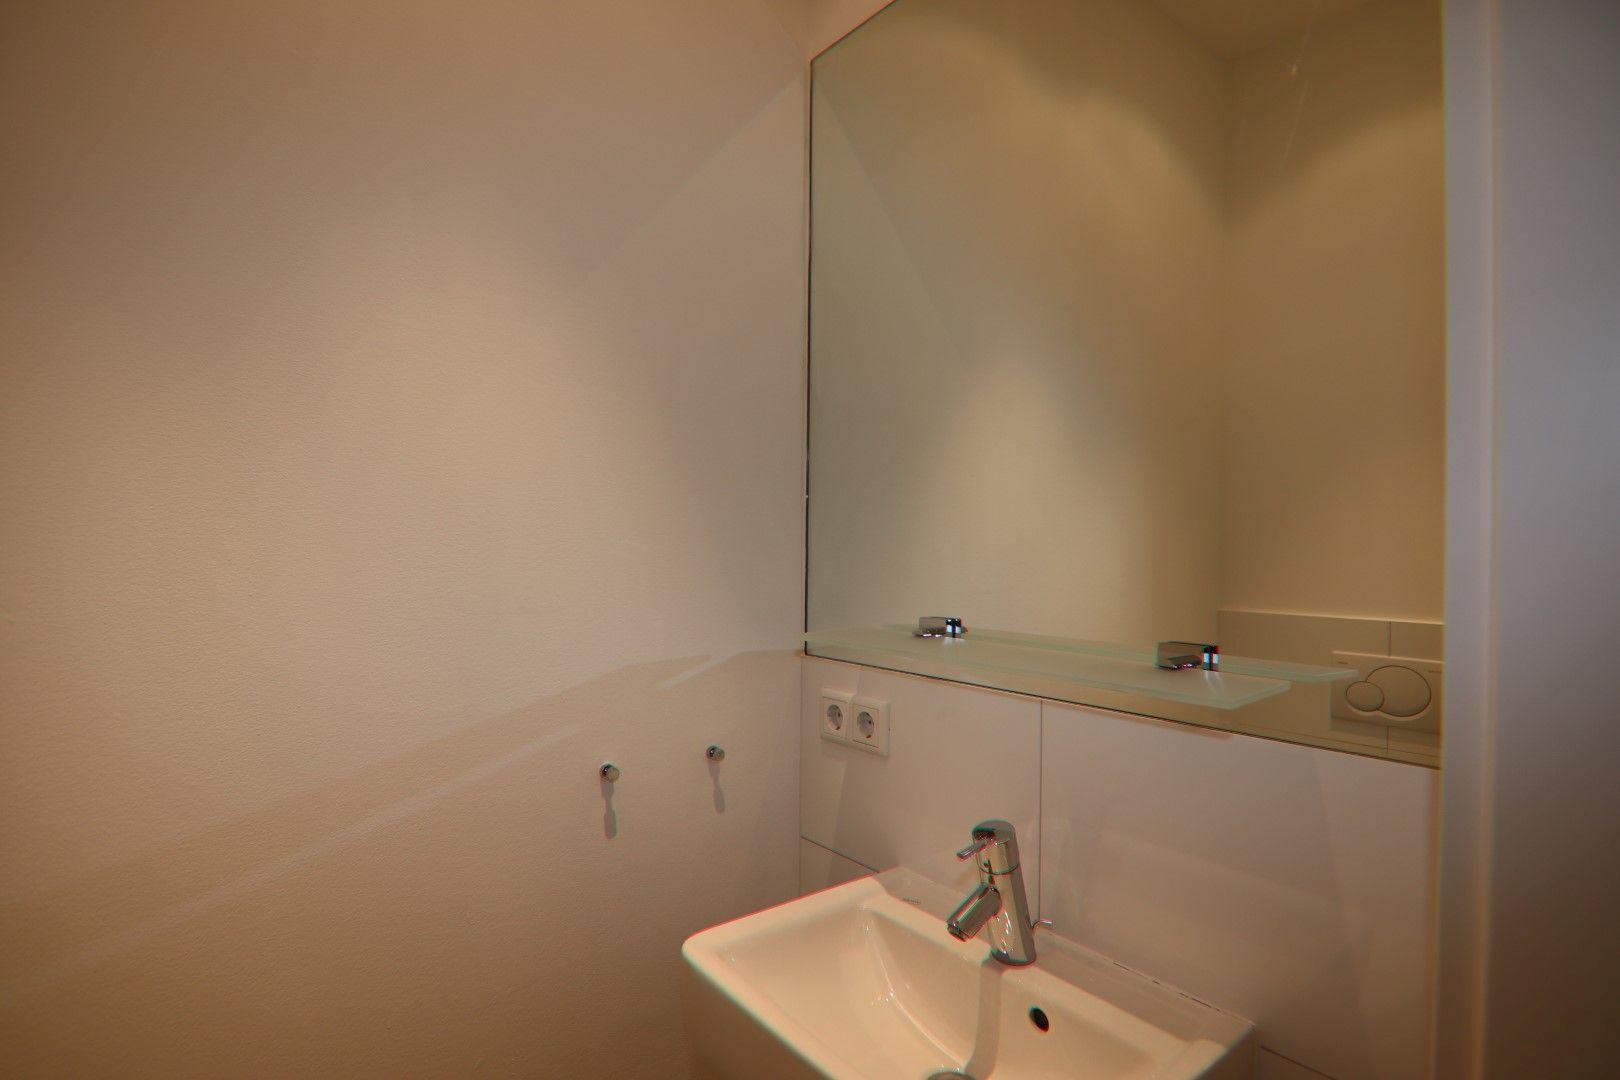 Immobilie Nr.0271 - 3-Zimmer-Altbauwohnung mit Aufzug im 3.OG - Bild 11.jpg